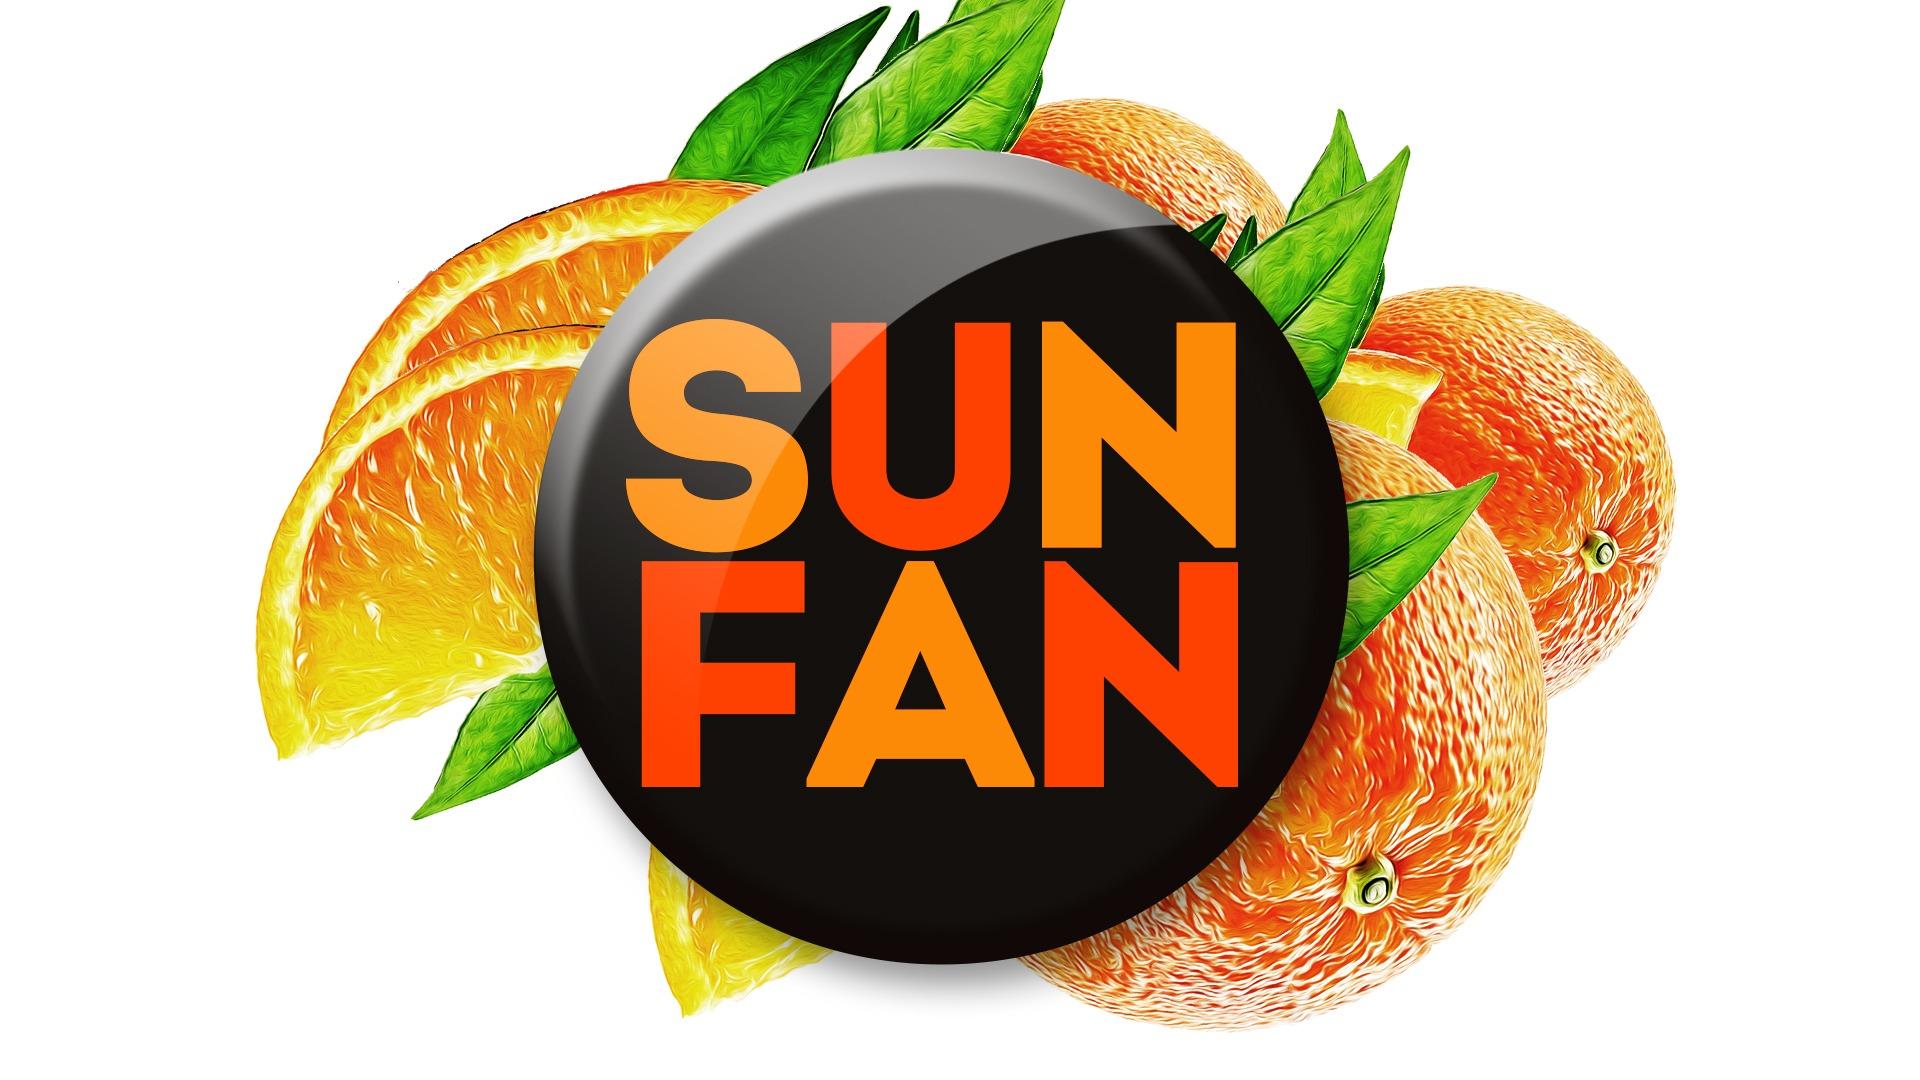 Агентство Асгард, напиток SUN FUN, дизайн товарной марки, дизайн этикетки